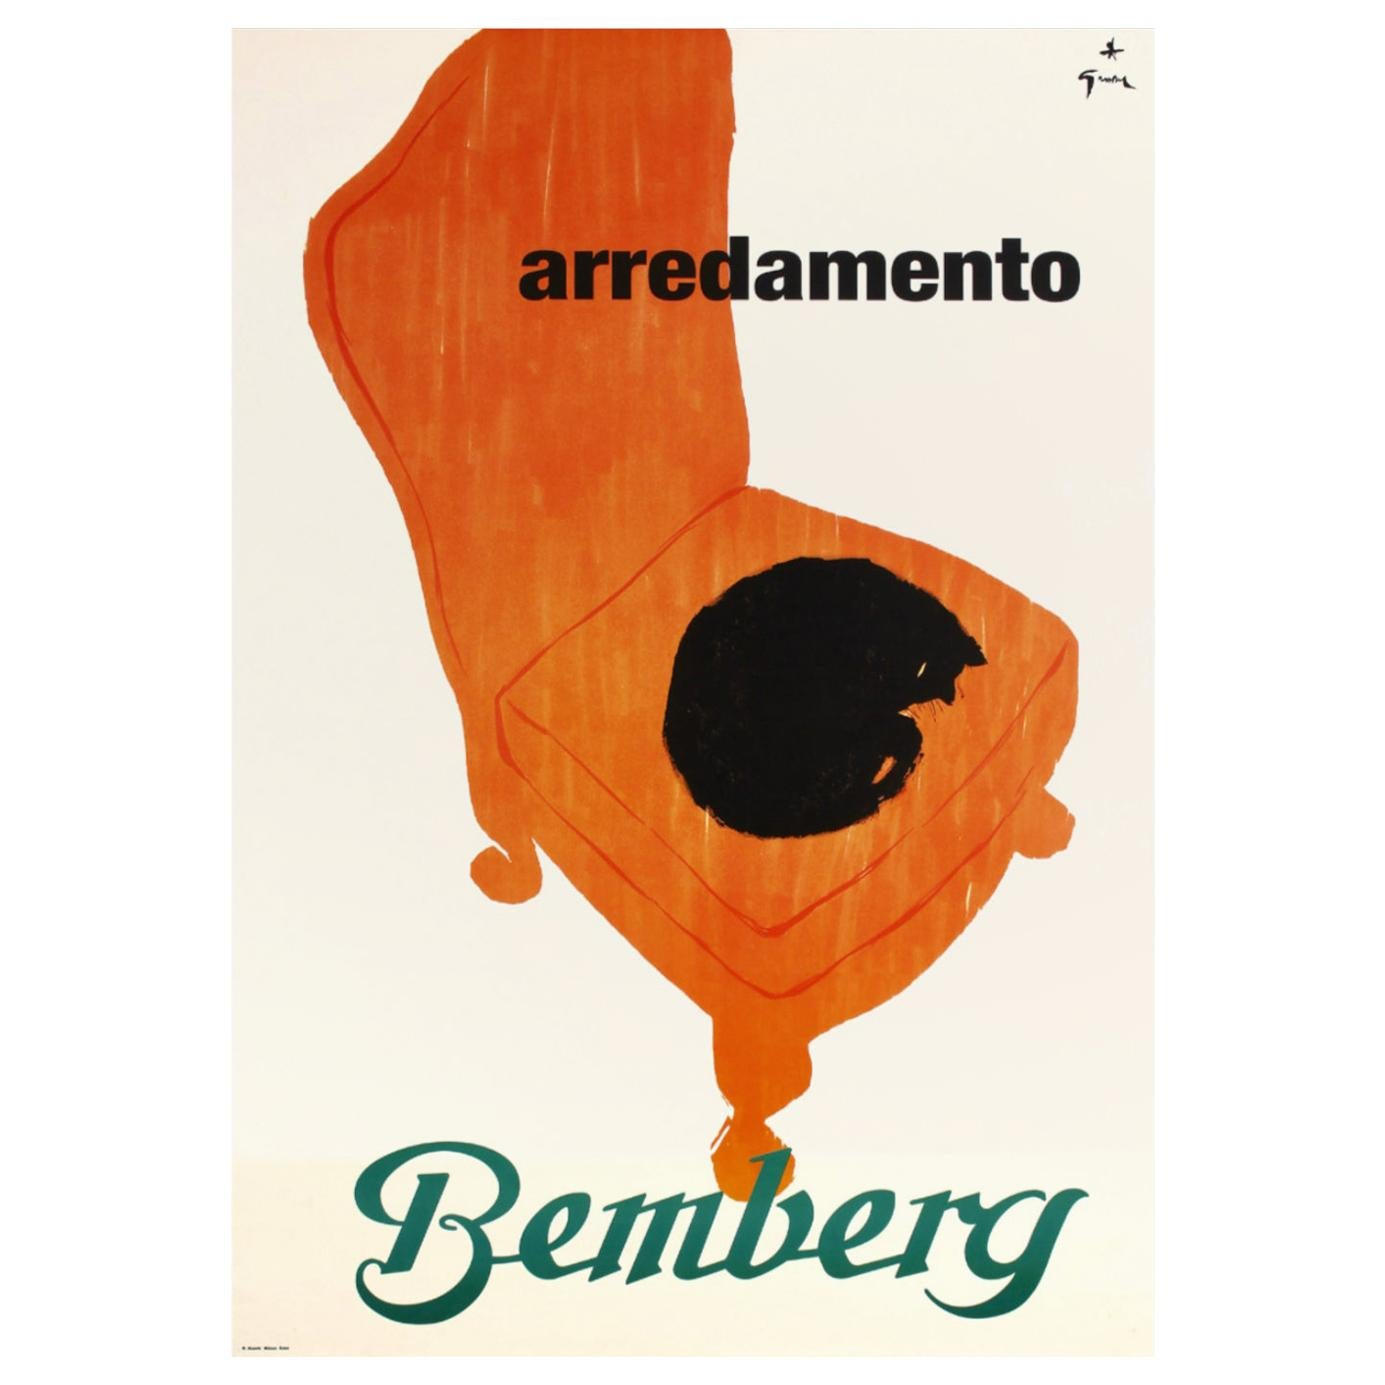 Original Vintage Double Sheet Poster, 'Bemberg Arredamento Cat' by Rene Gruau